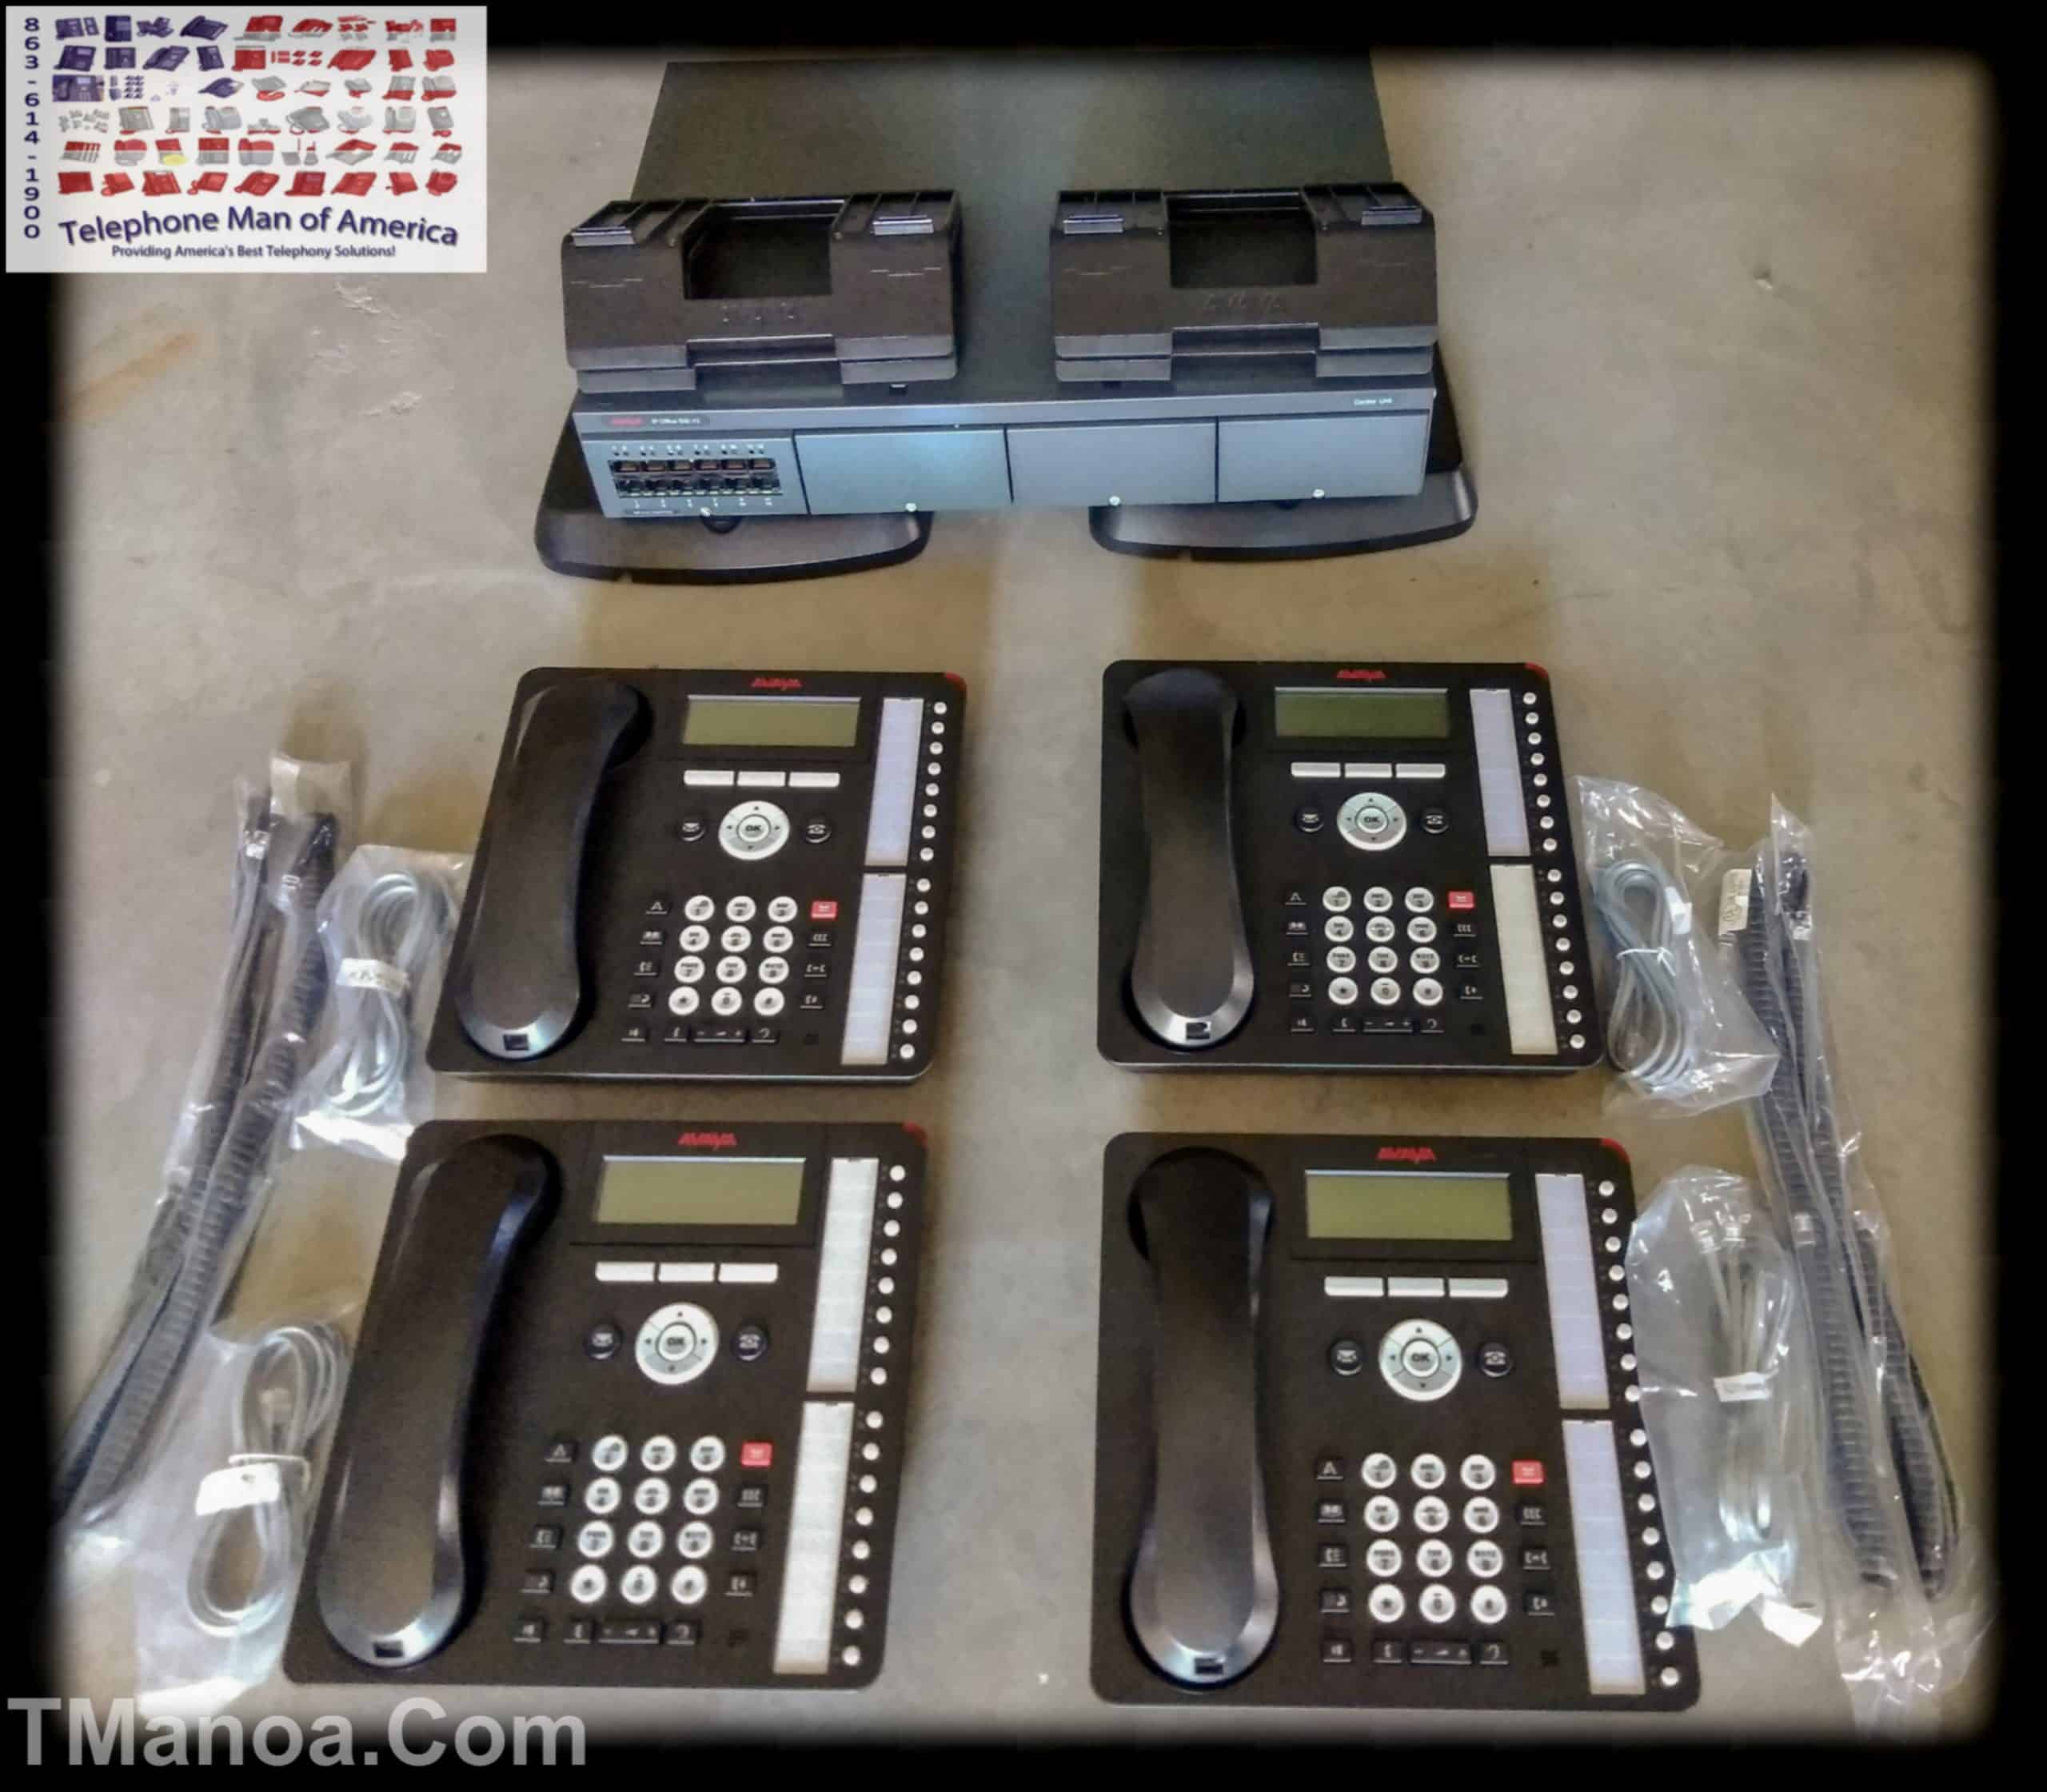 Avaya IP Office 500 V2 Phone System with 4 1416 Phones